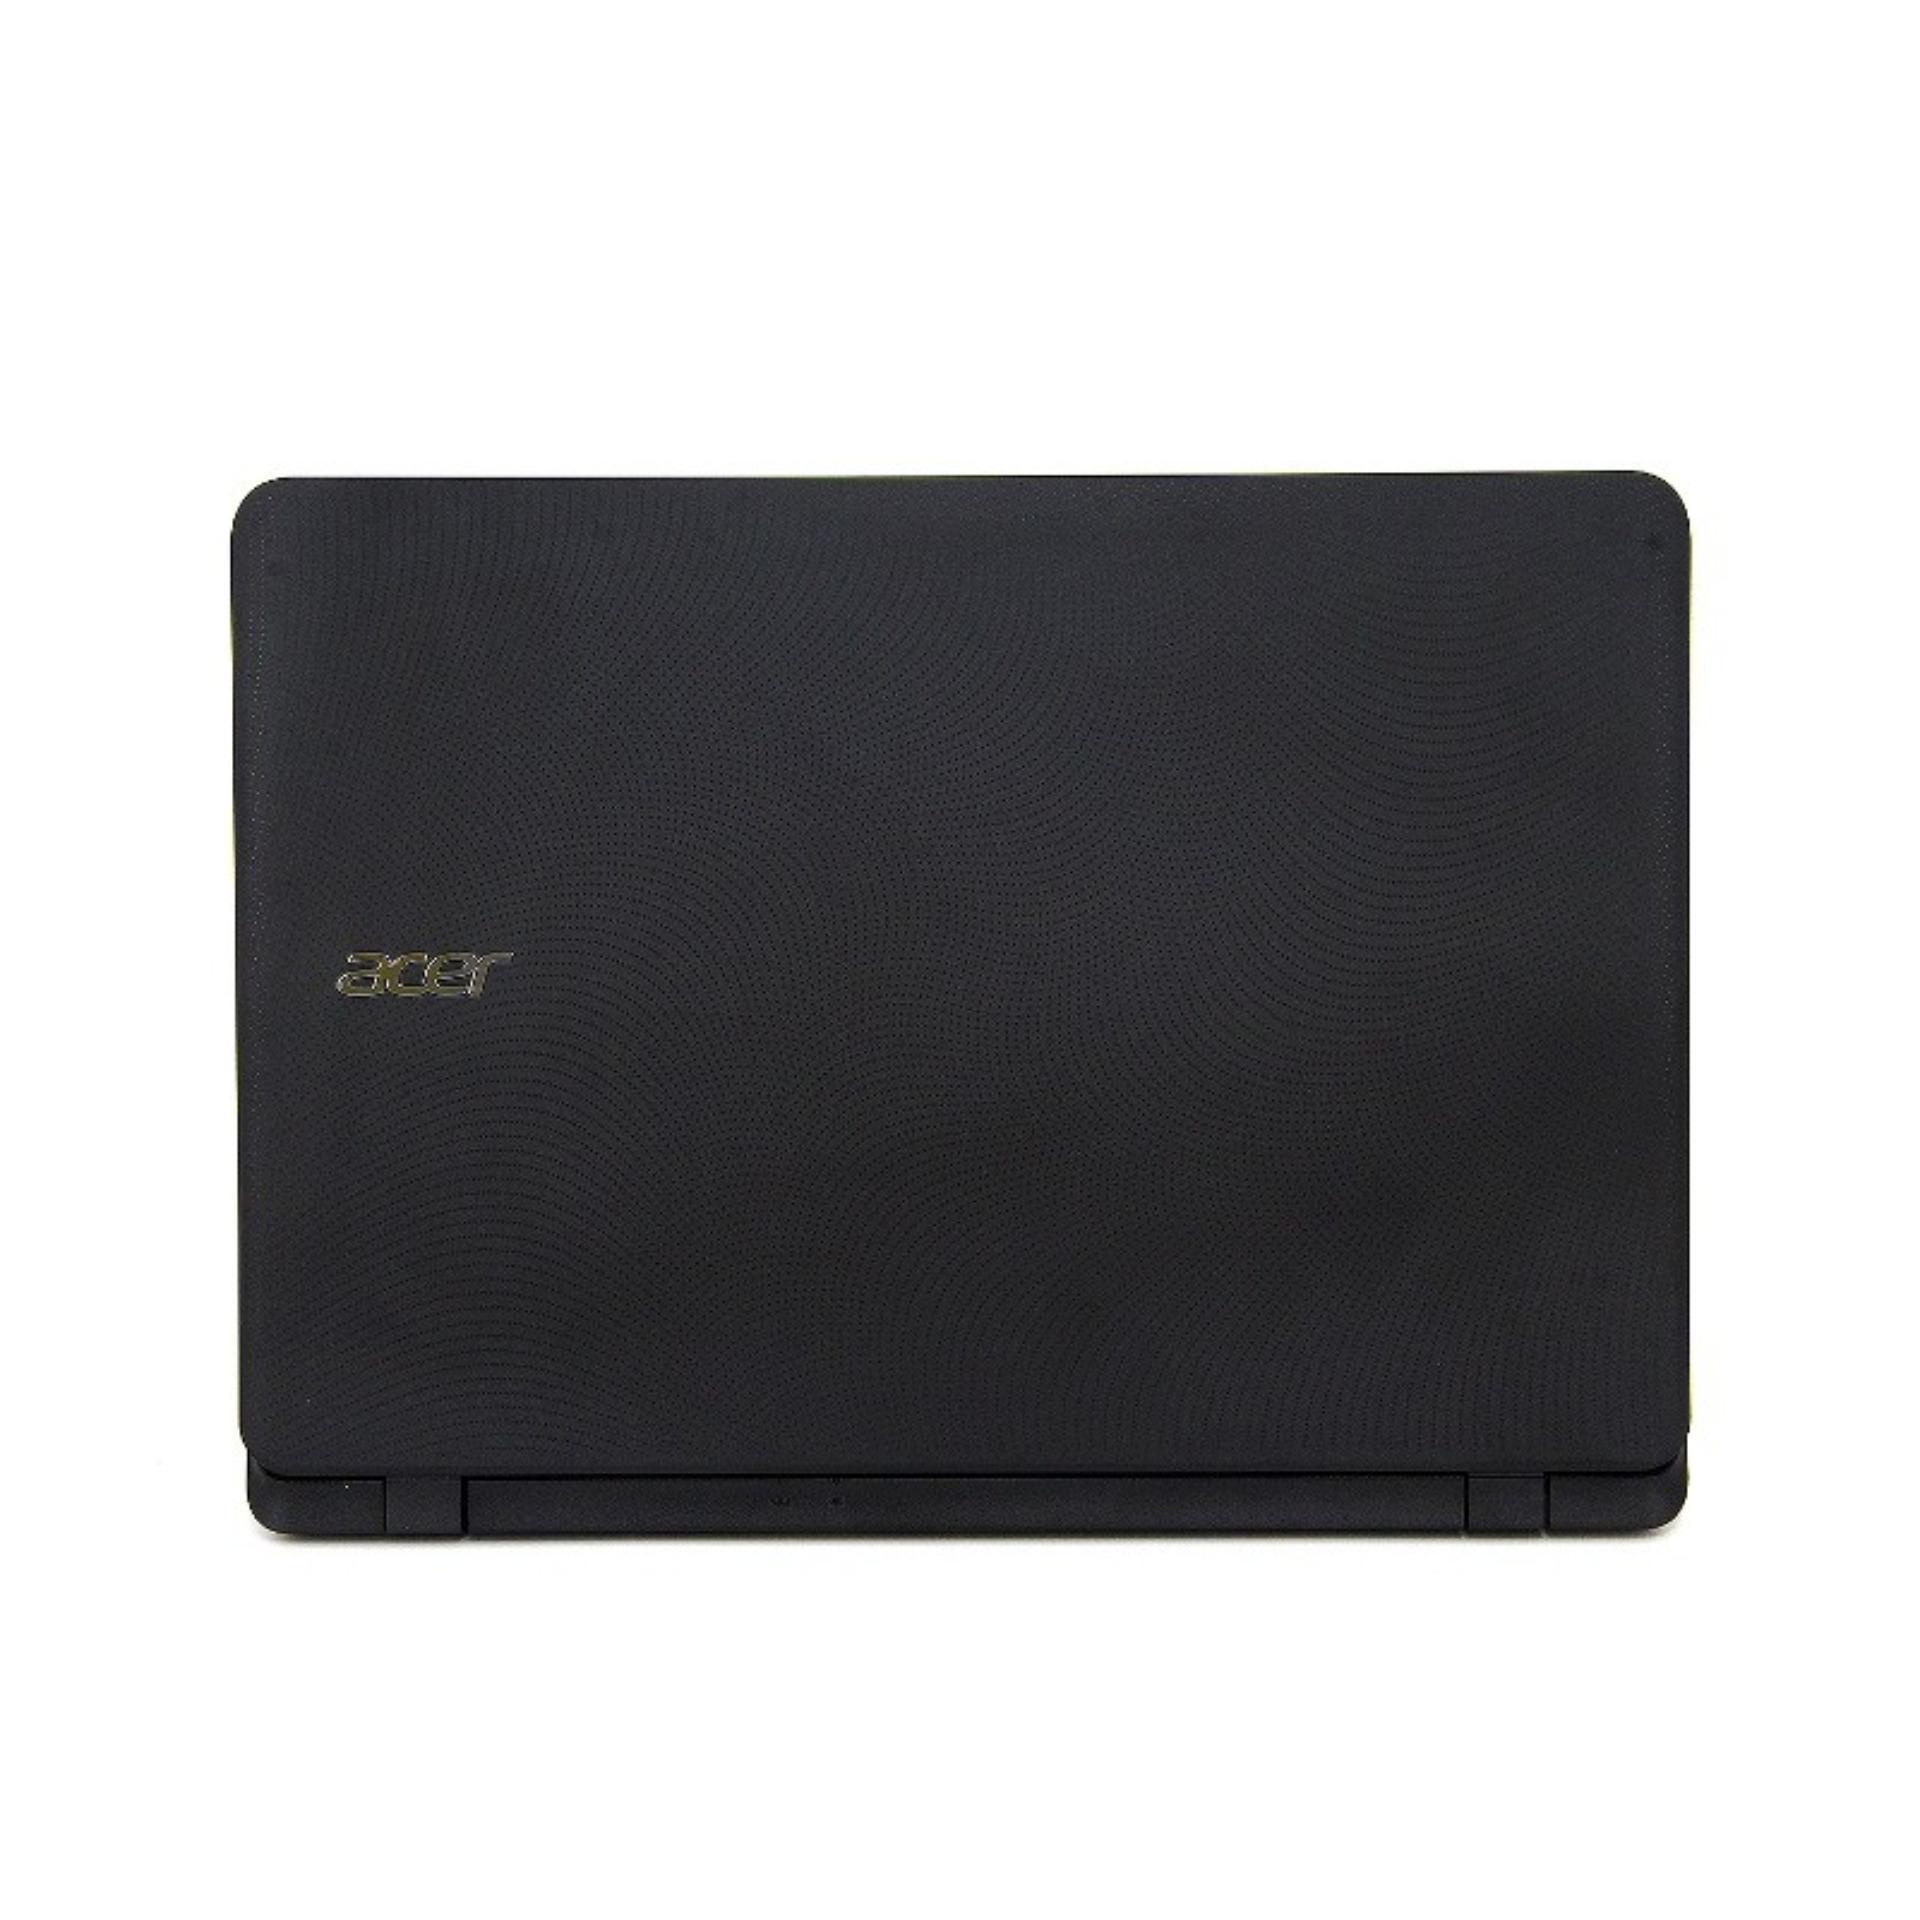 Netbook Acer ES1 132 Plus Windows 10 Intel 3350 Ram 2GB HDD 500Gb Intel - Garansi Resmi